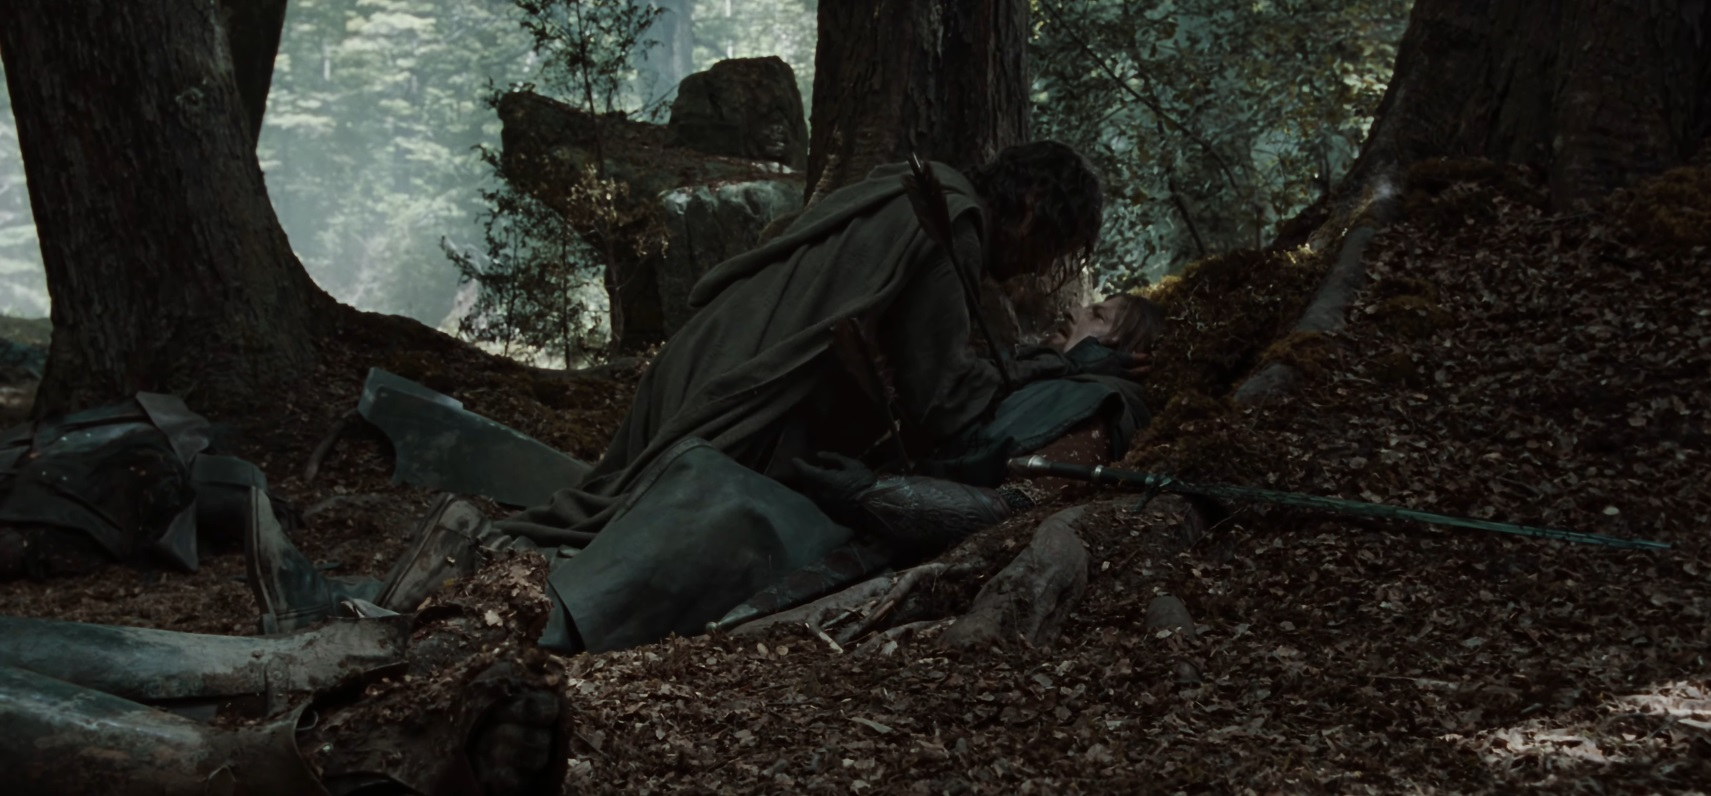 File:Death of Boromir.jpg